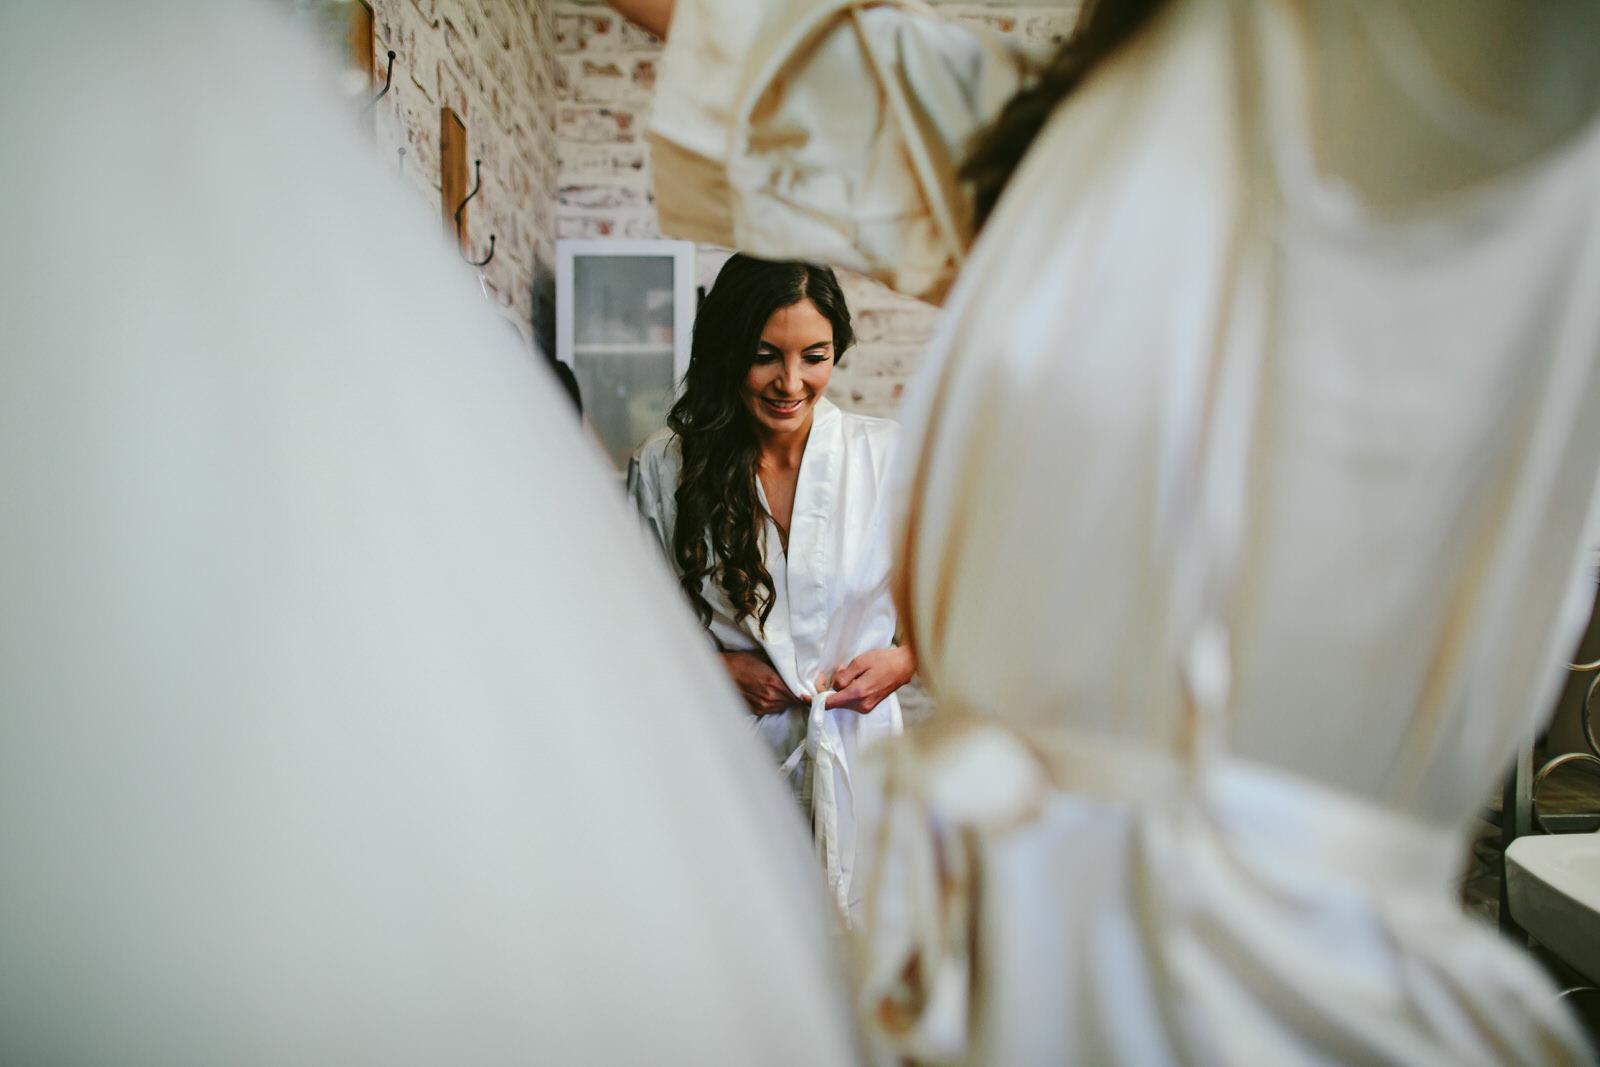 getting_ready_salon_wedding_day_stuart_wedding_photographer-121.jpg